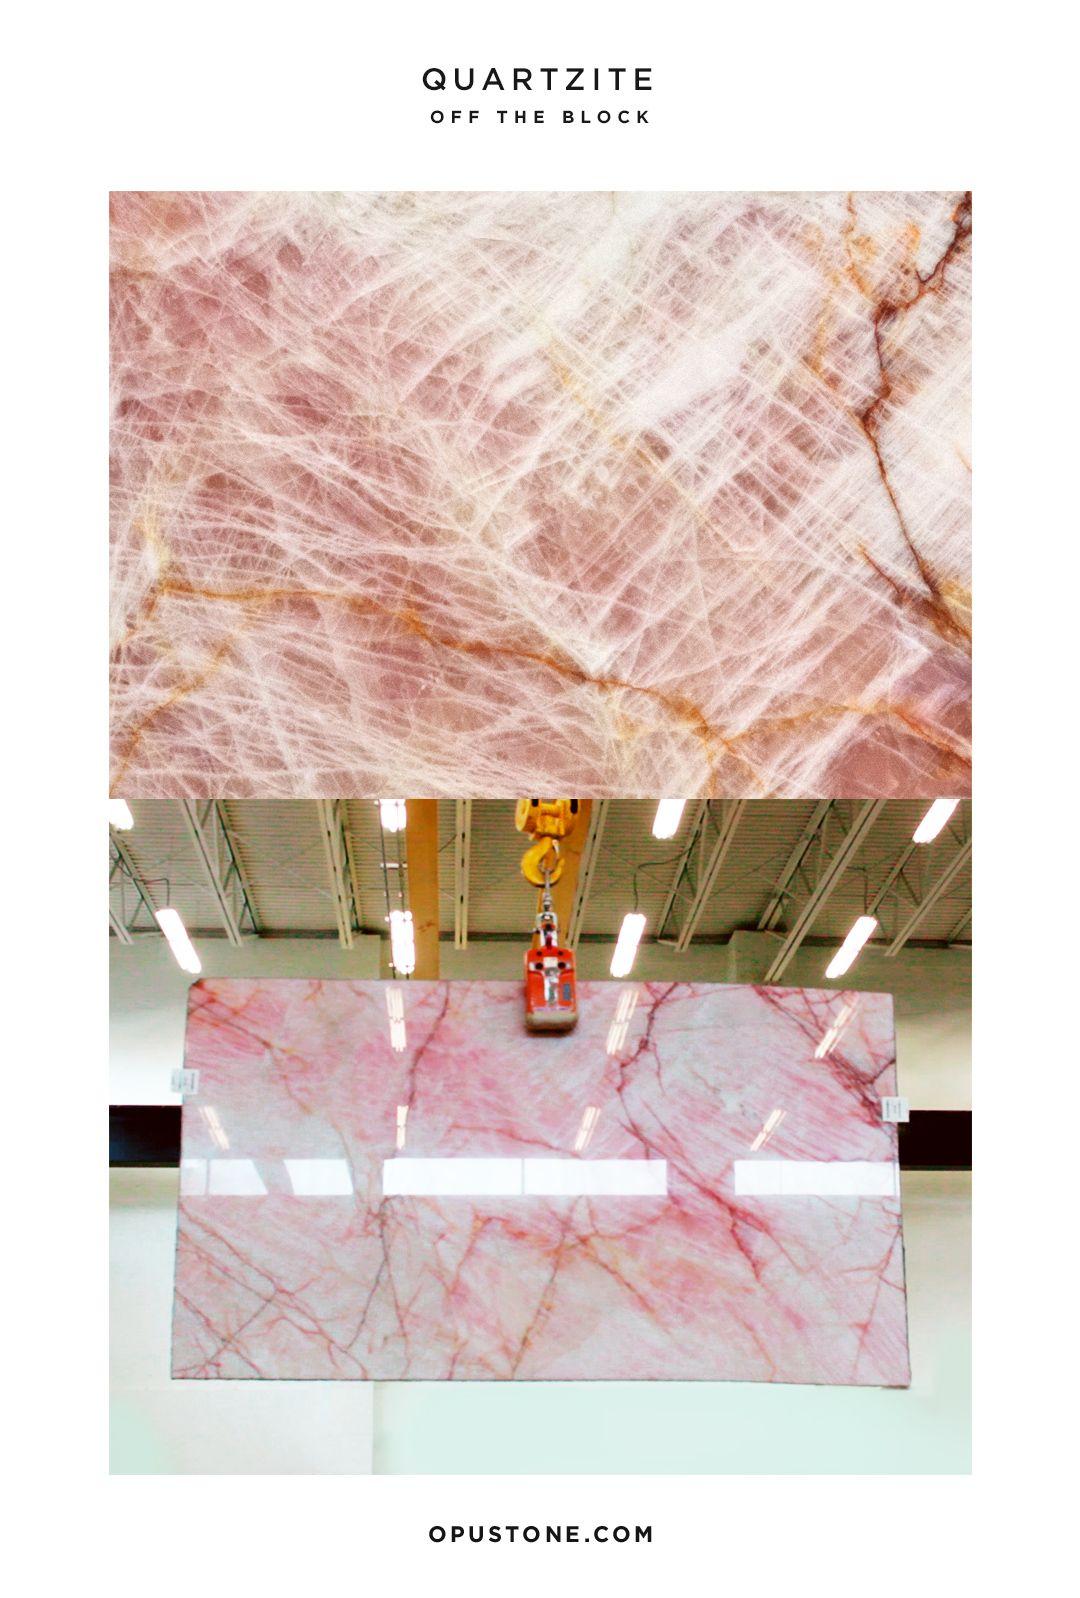 Experience La Vie On Rose With A Slab Like No Other Pink Rose Quartzite Slab Slabporn Slabs Opustone Pinkstone Sto Quartzite Pink Quartz Pink Stone